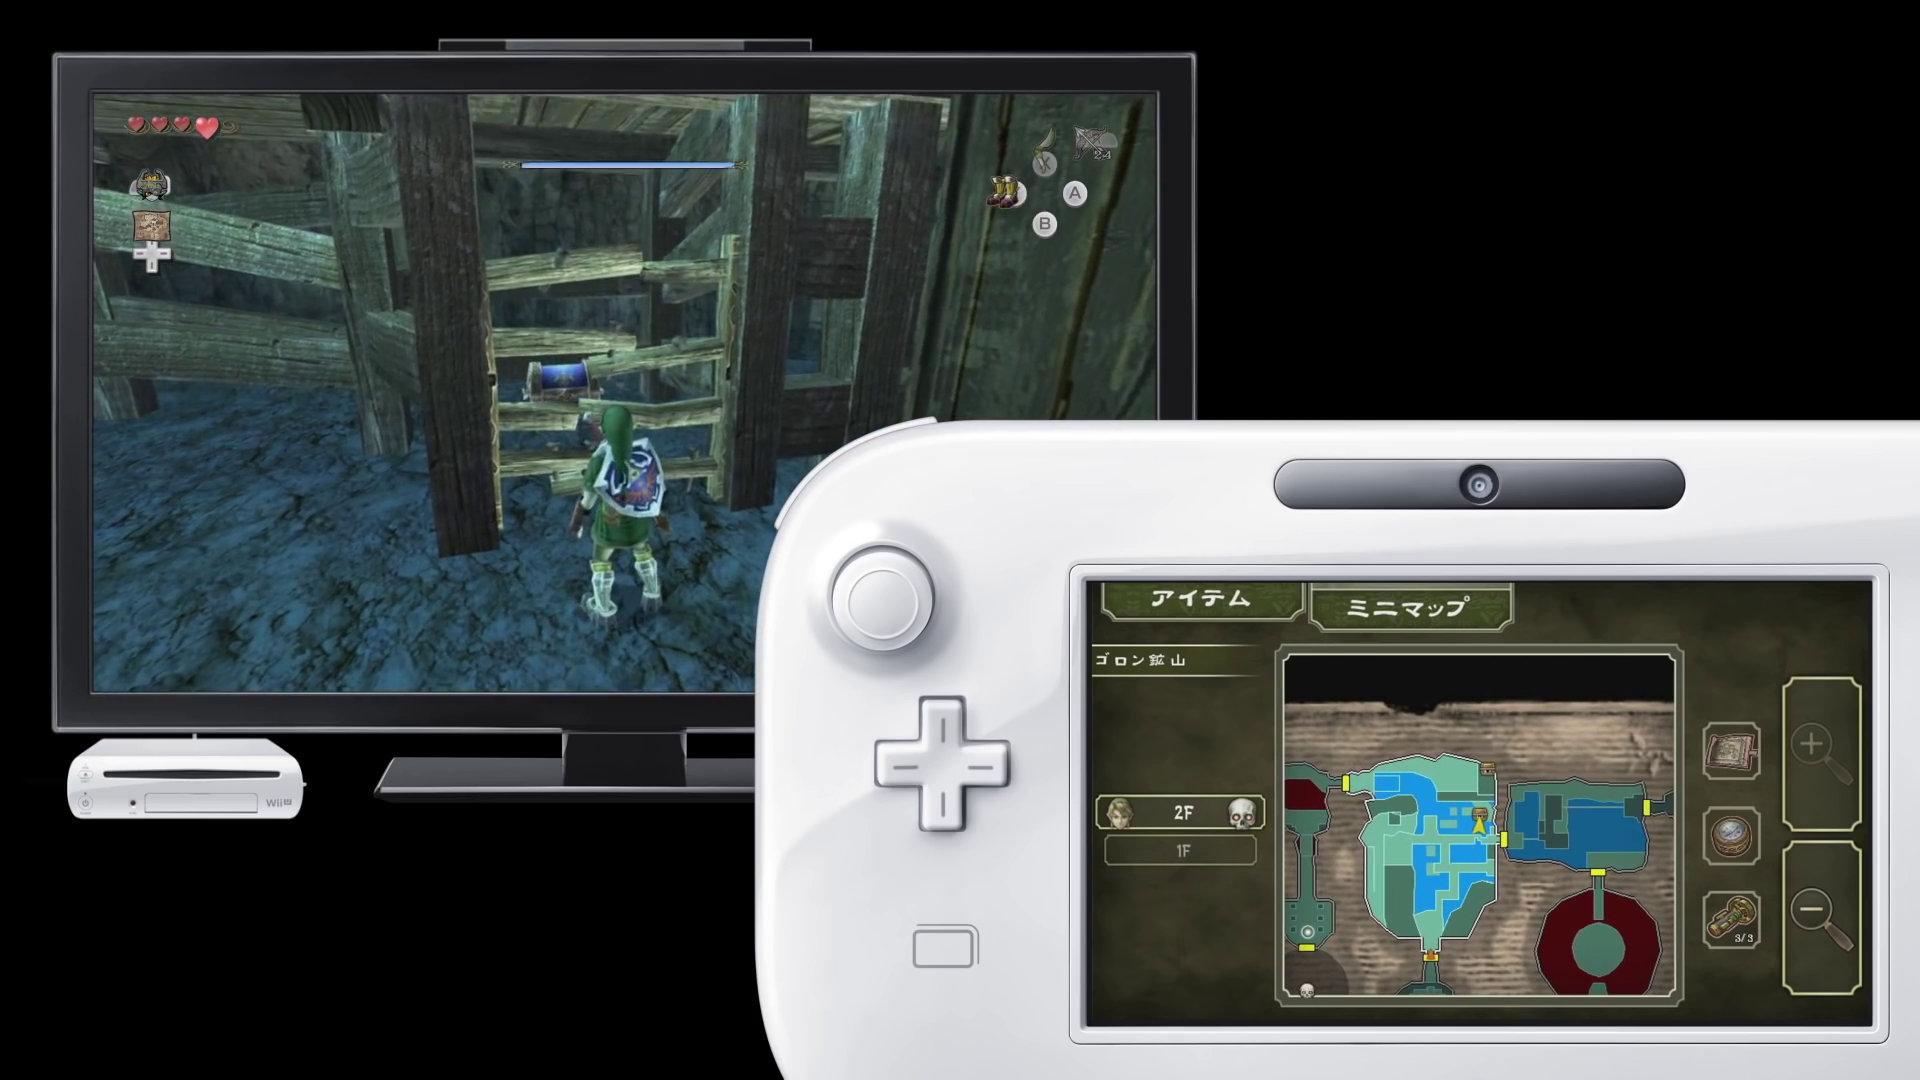 WiiU『ゼルダの伝説 トワイライトプリンセスHD』、開発中はWiiリモコン操作への対応も検討